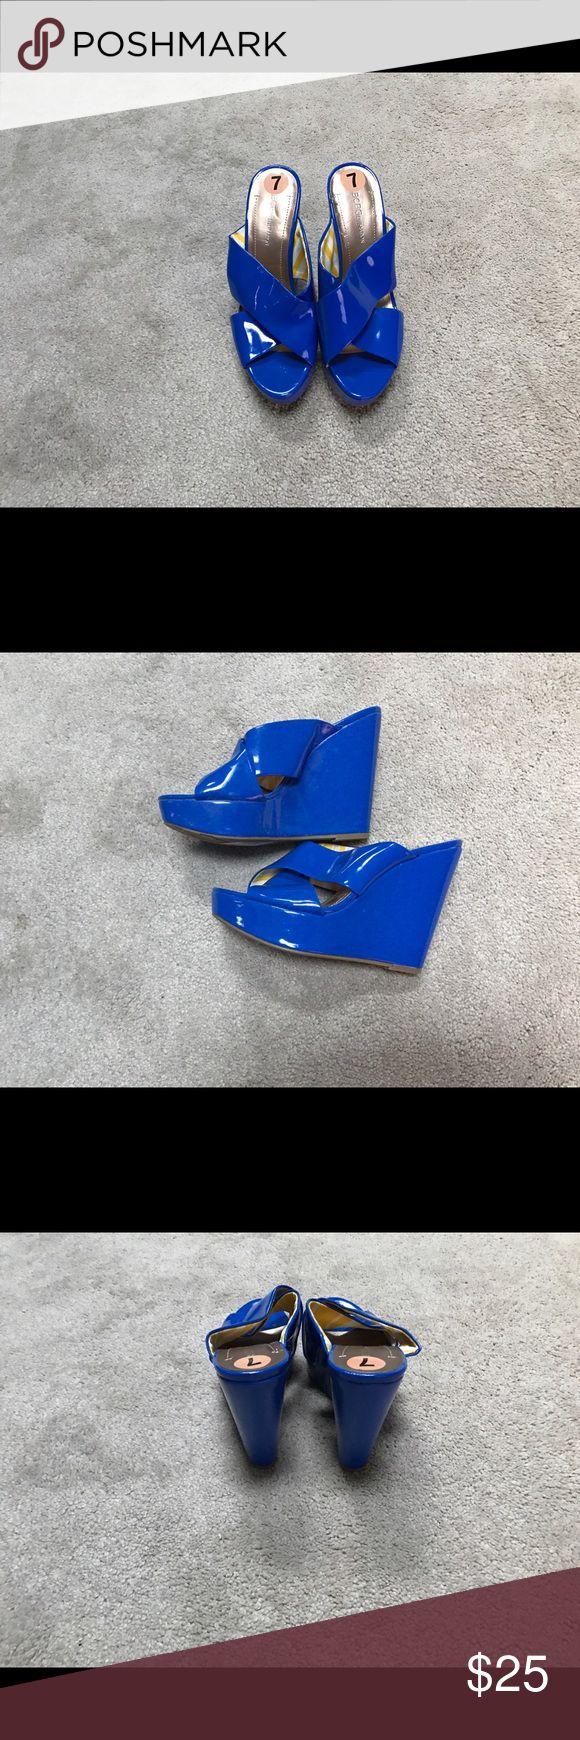 BCBGENERATION Wedges Royal Blue BCBGENERATION Wedges Never Worn BCBGeneration Shoes Wedges